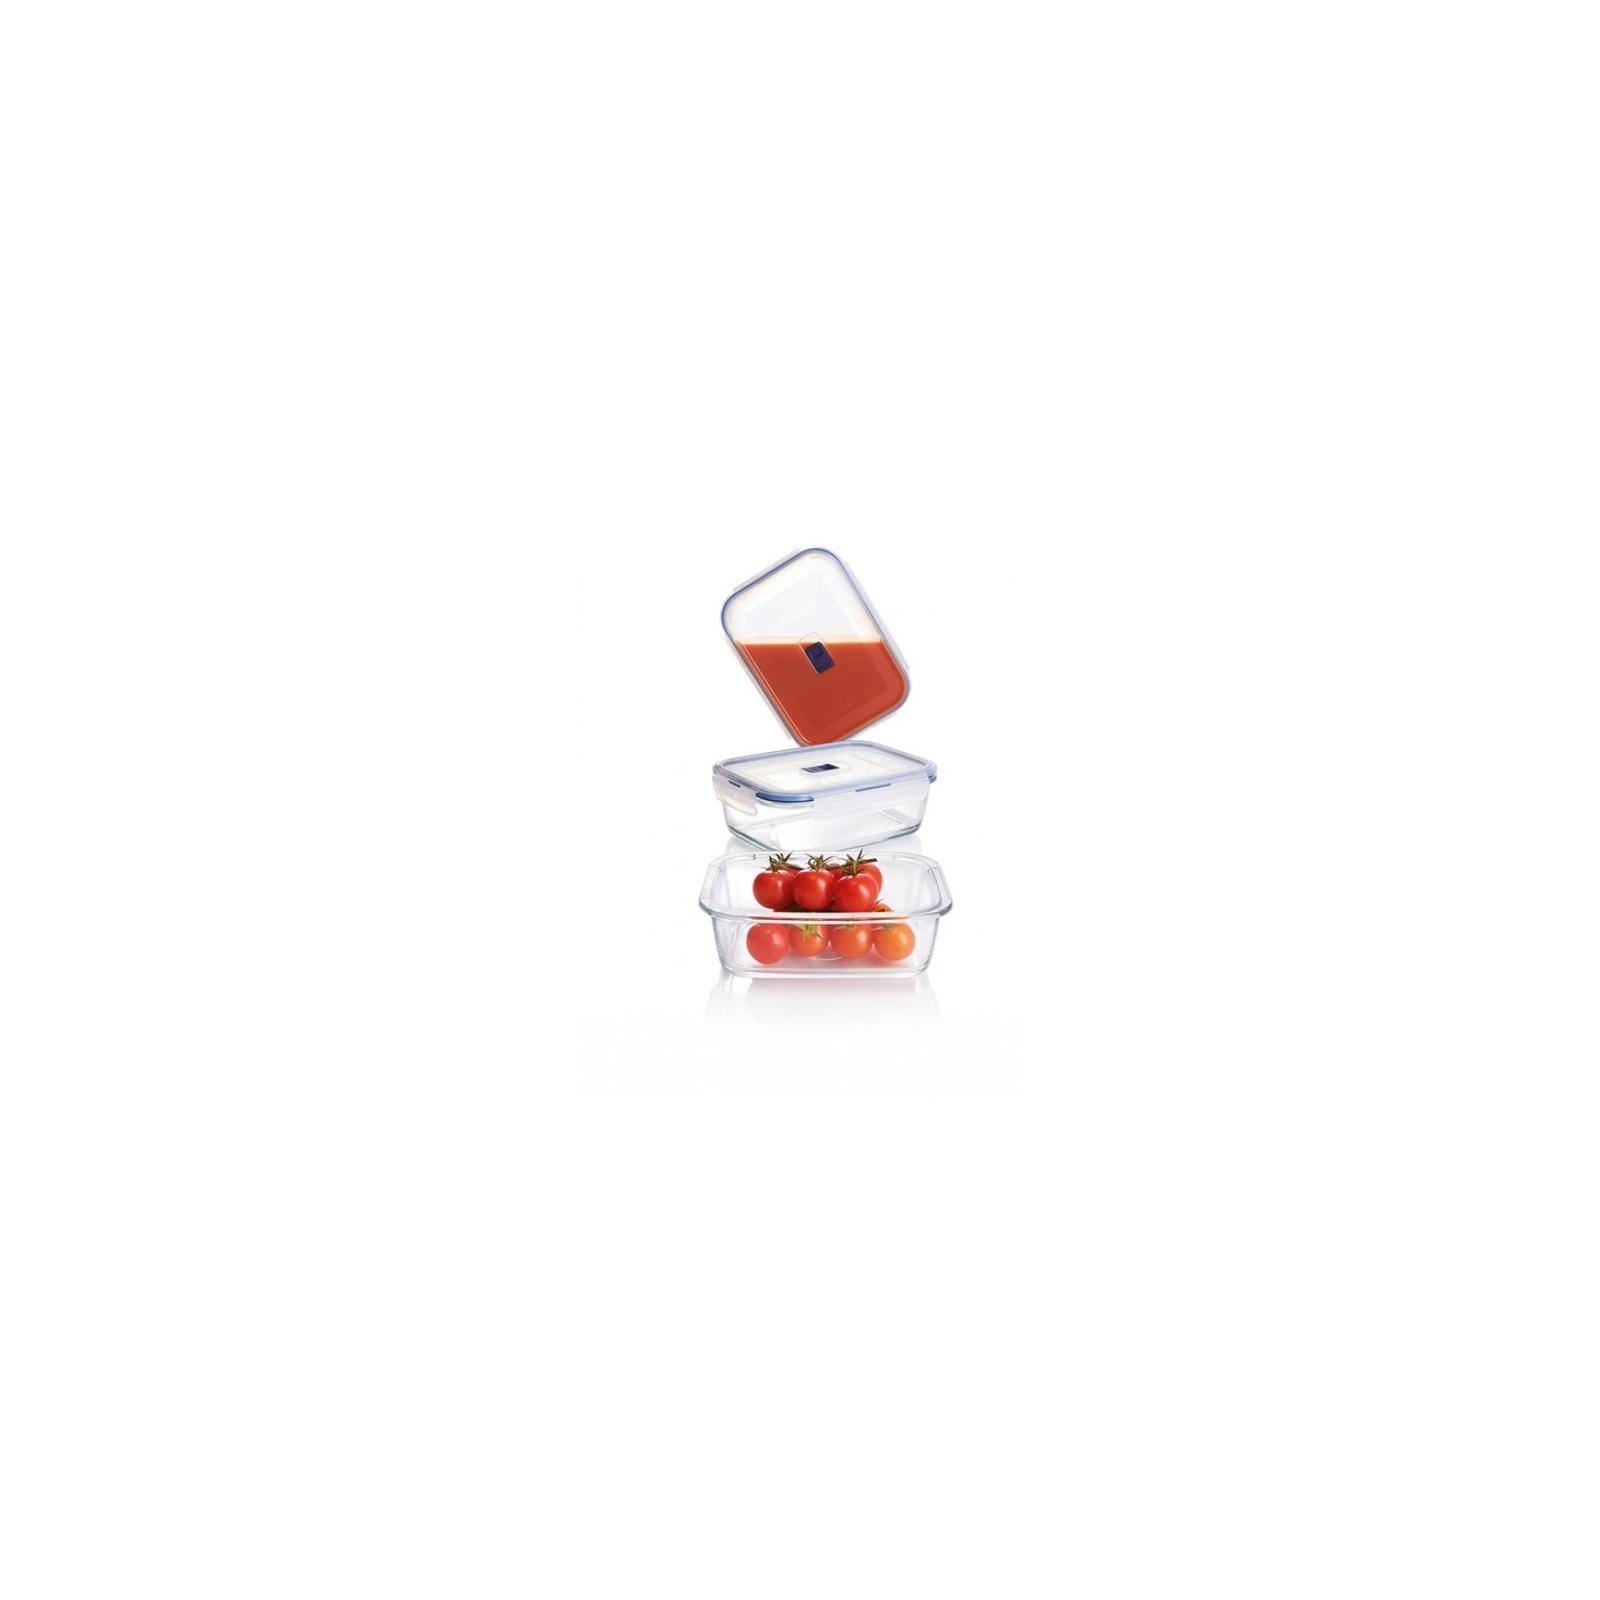 Пищевой контейнер Luminarc Pure Box Active набор 3шт прямоуг. 380мл/820мл/1220мл (P5275)